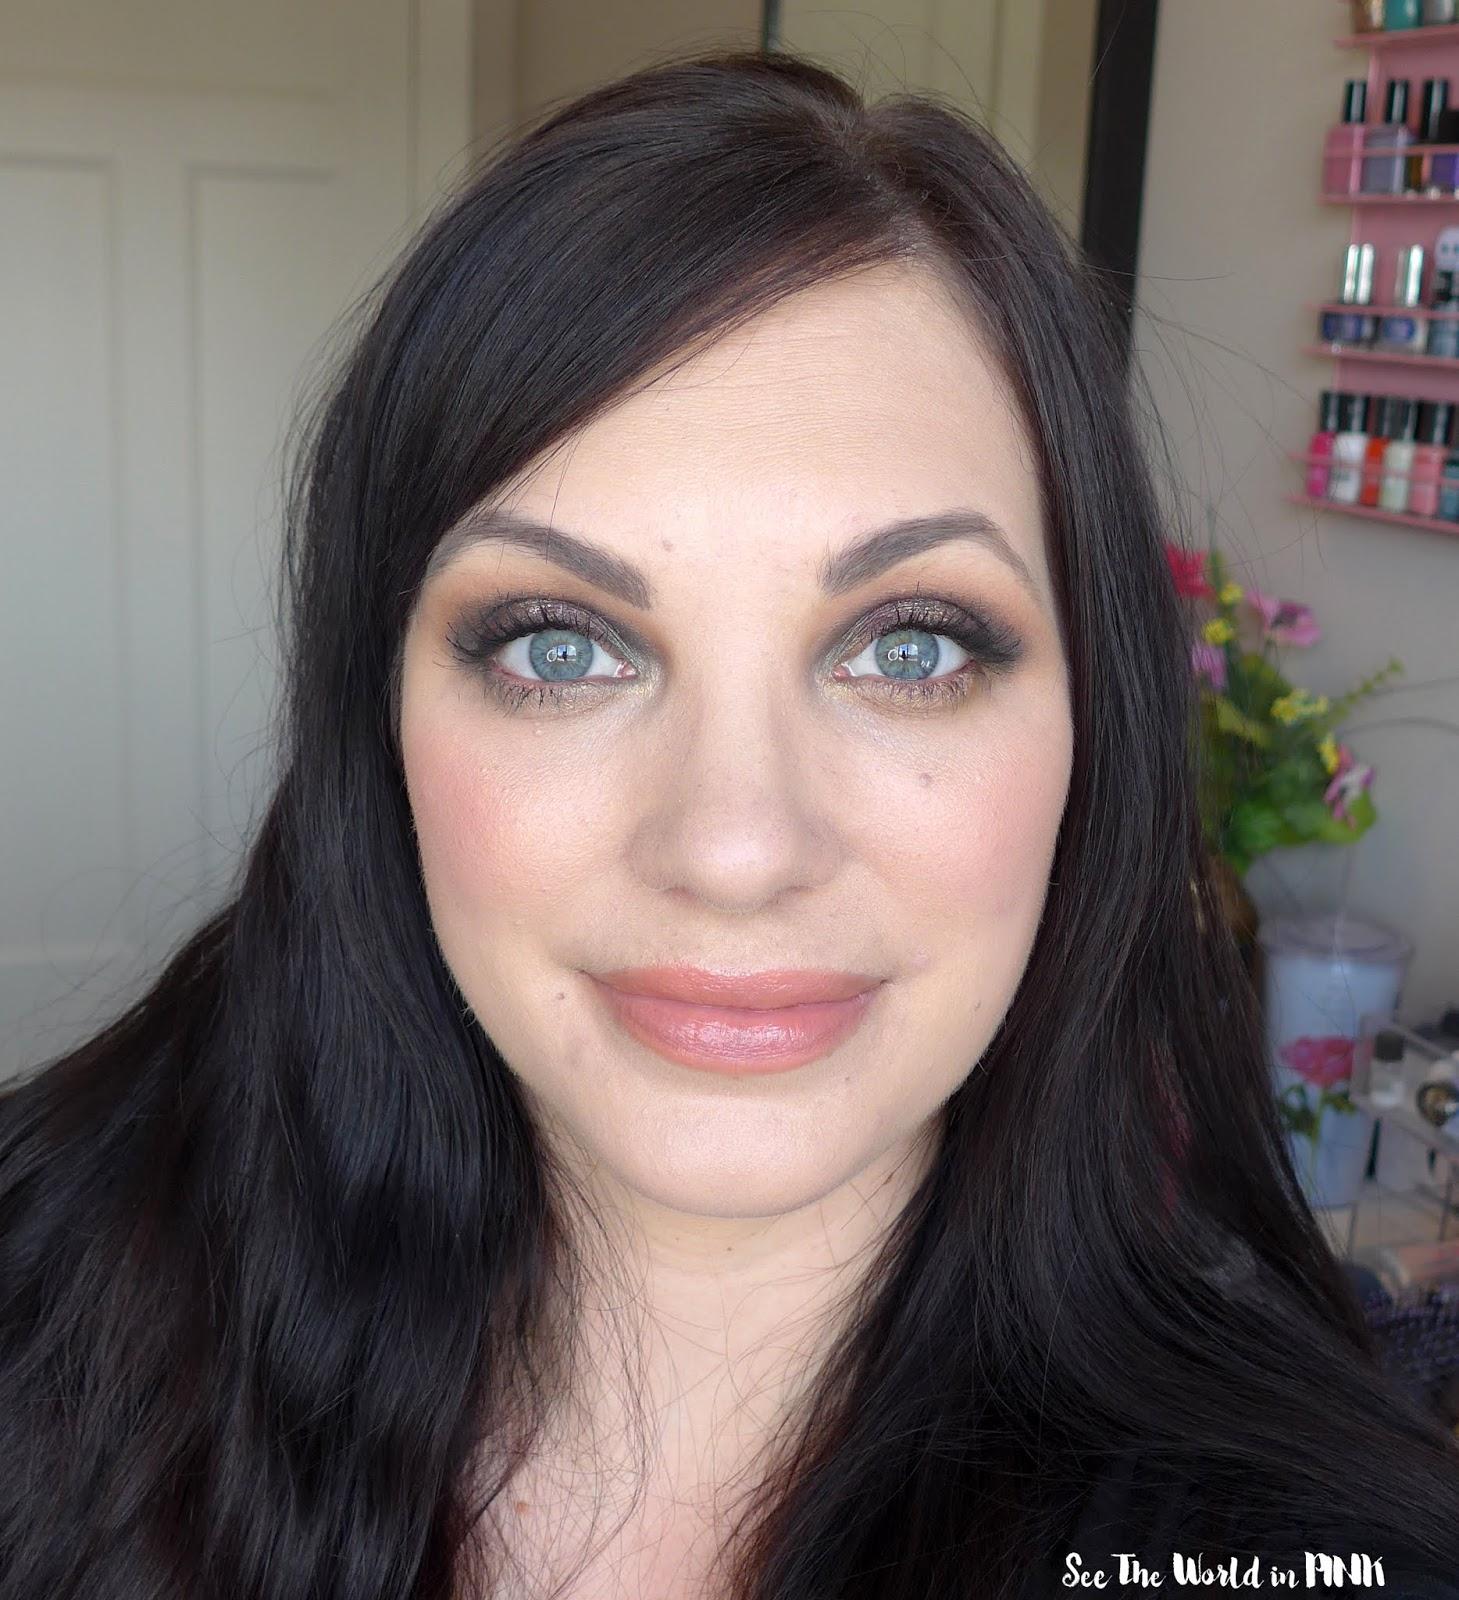 Urban Decay Game of Thrones Eyeshadow Palette and Sansa Stark Vice Lipstick